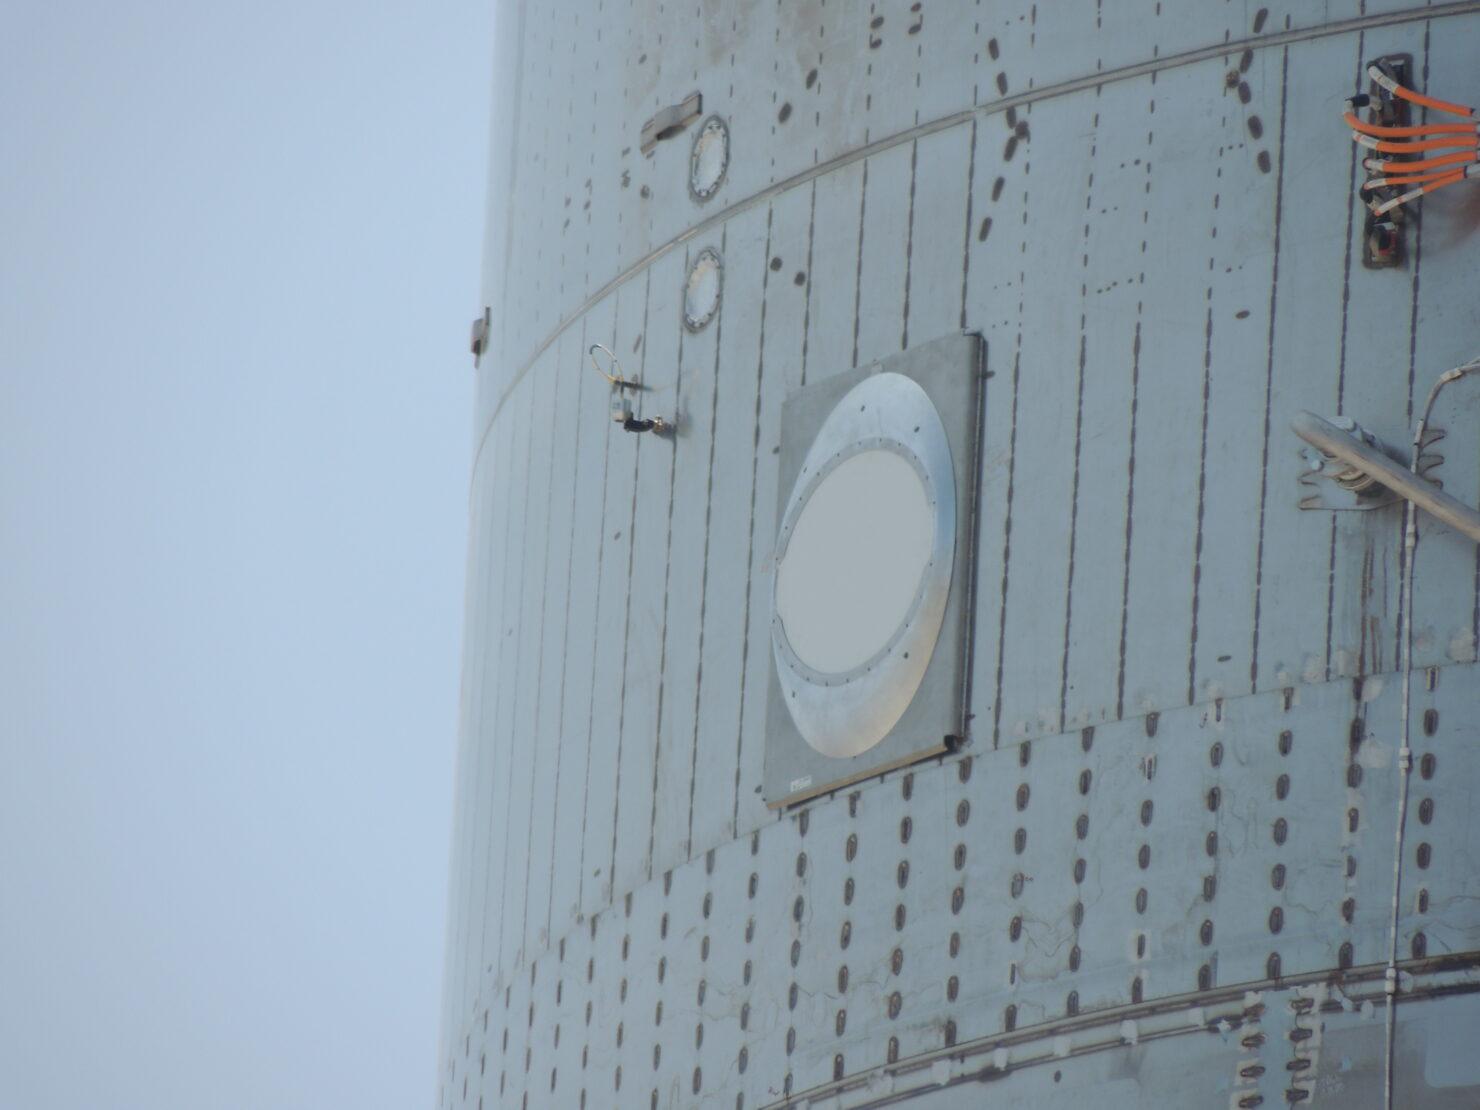 spacex-starship-sn15-dish-starlink-1